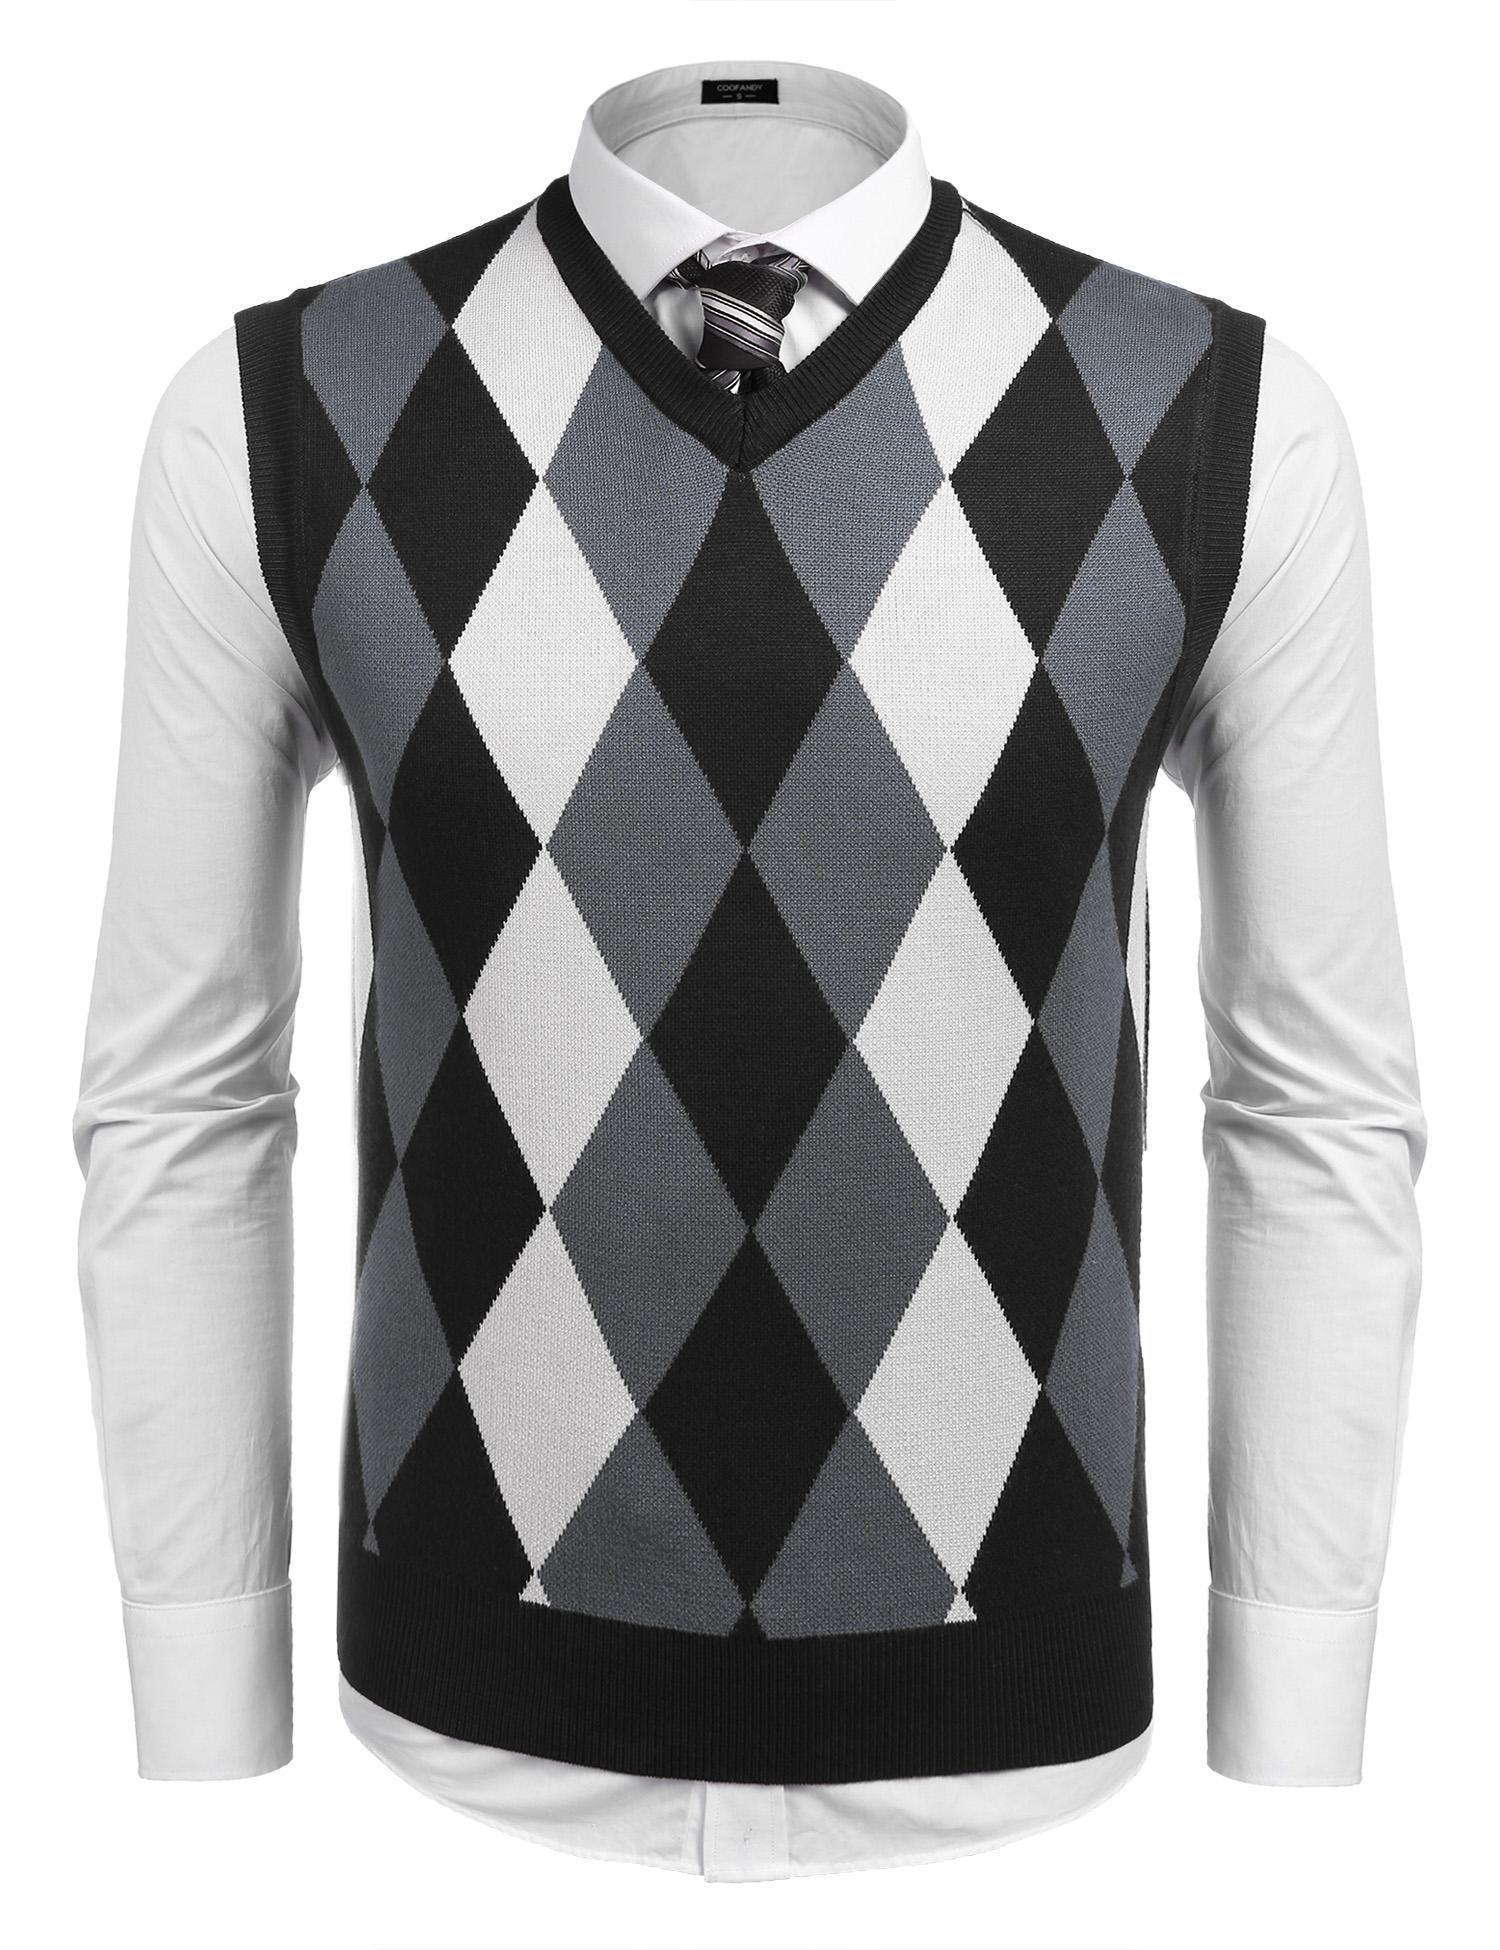 Coofandy Men's Casual Slim Fit V-neck Rhombus Business Knitwear Sweater Vest,Black,Small